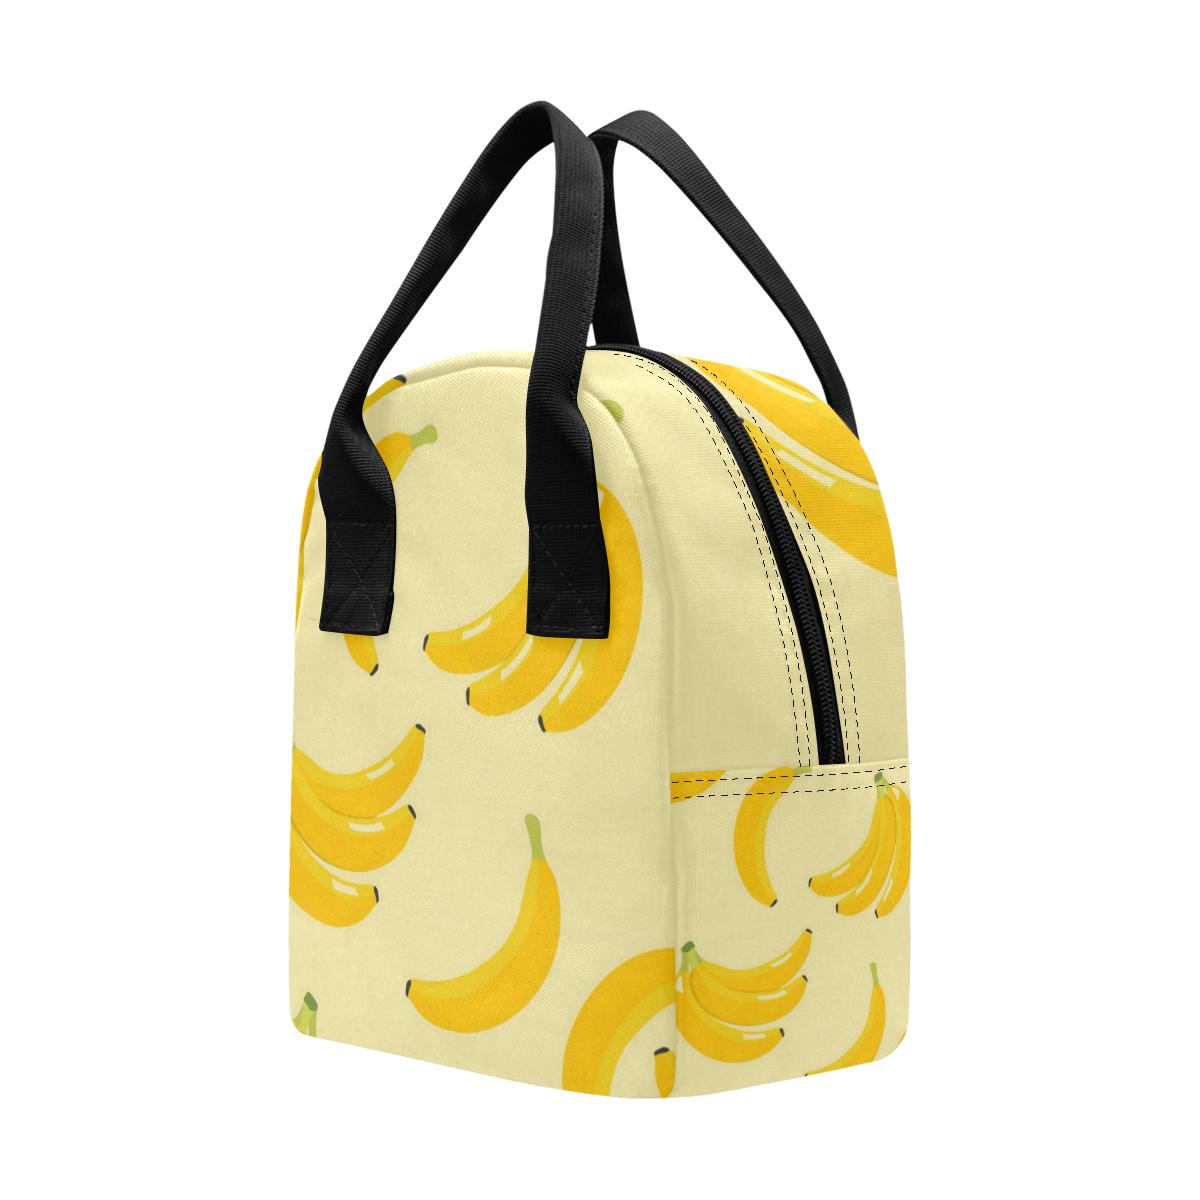 Banana Lunch Bag Zipper Lunch Bag (Model 1689)